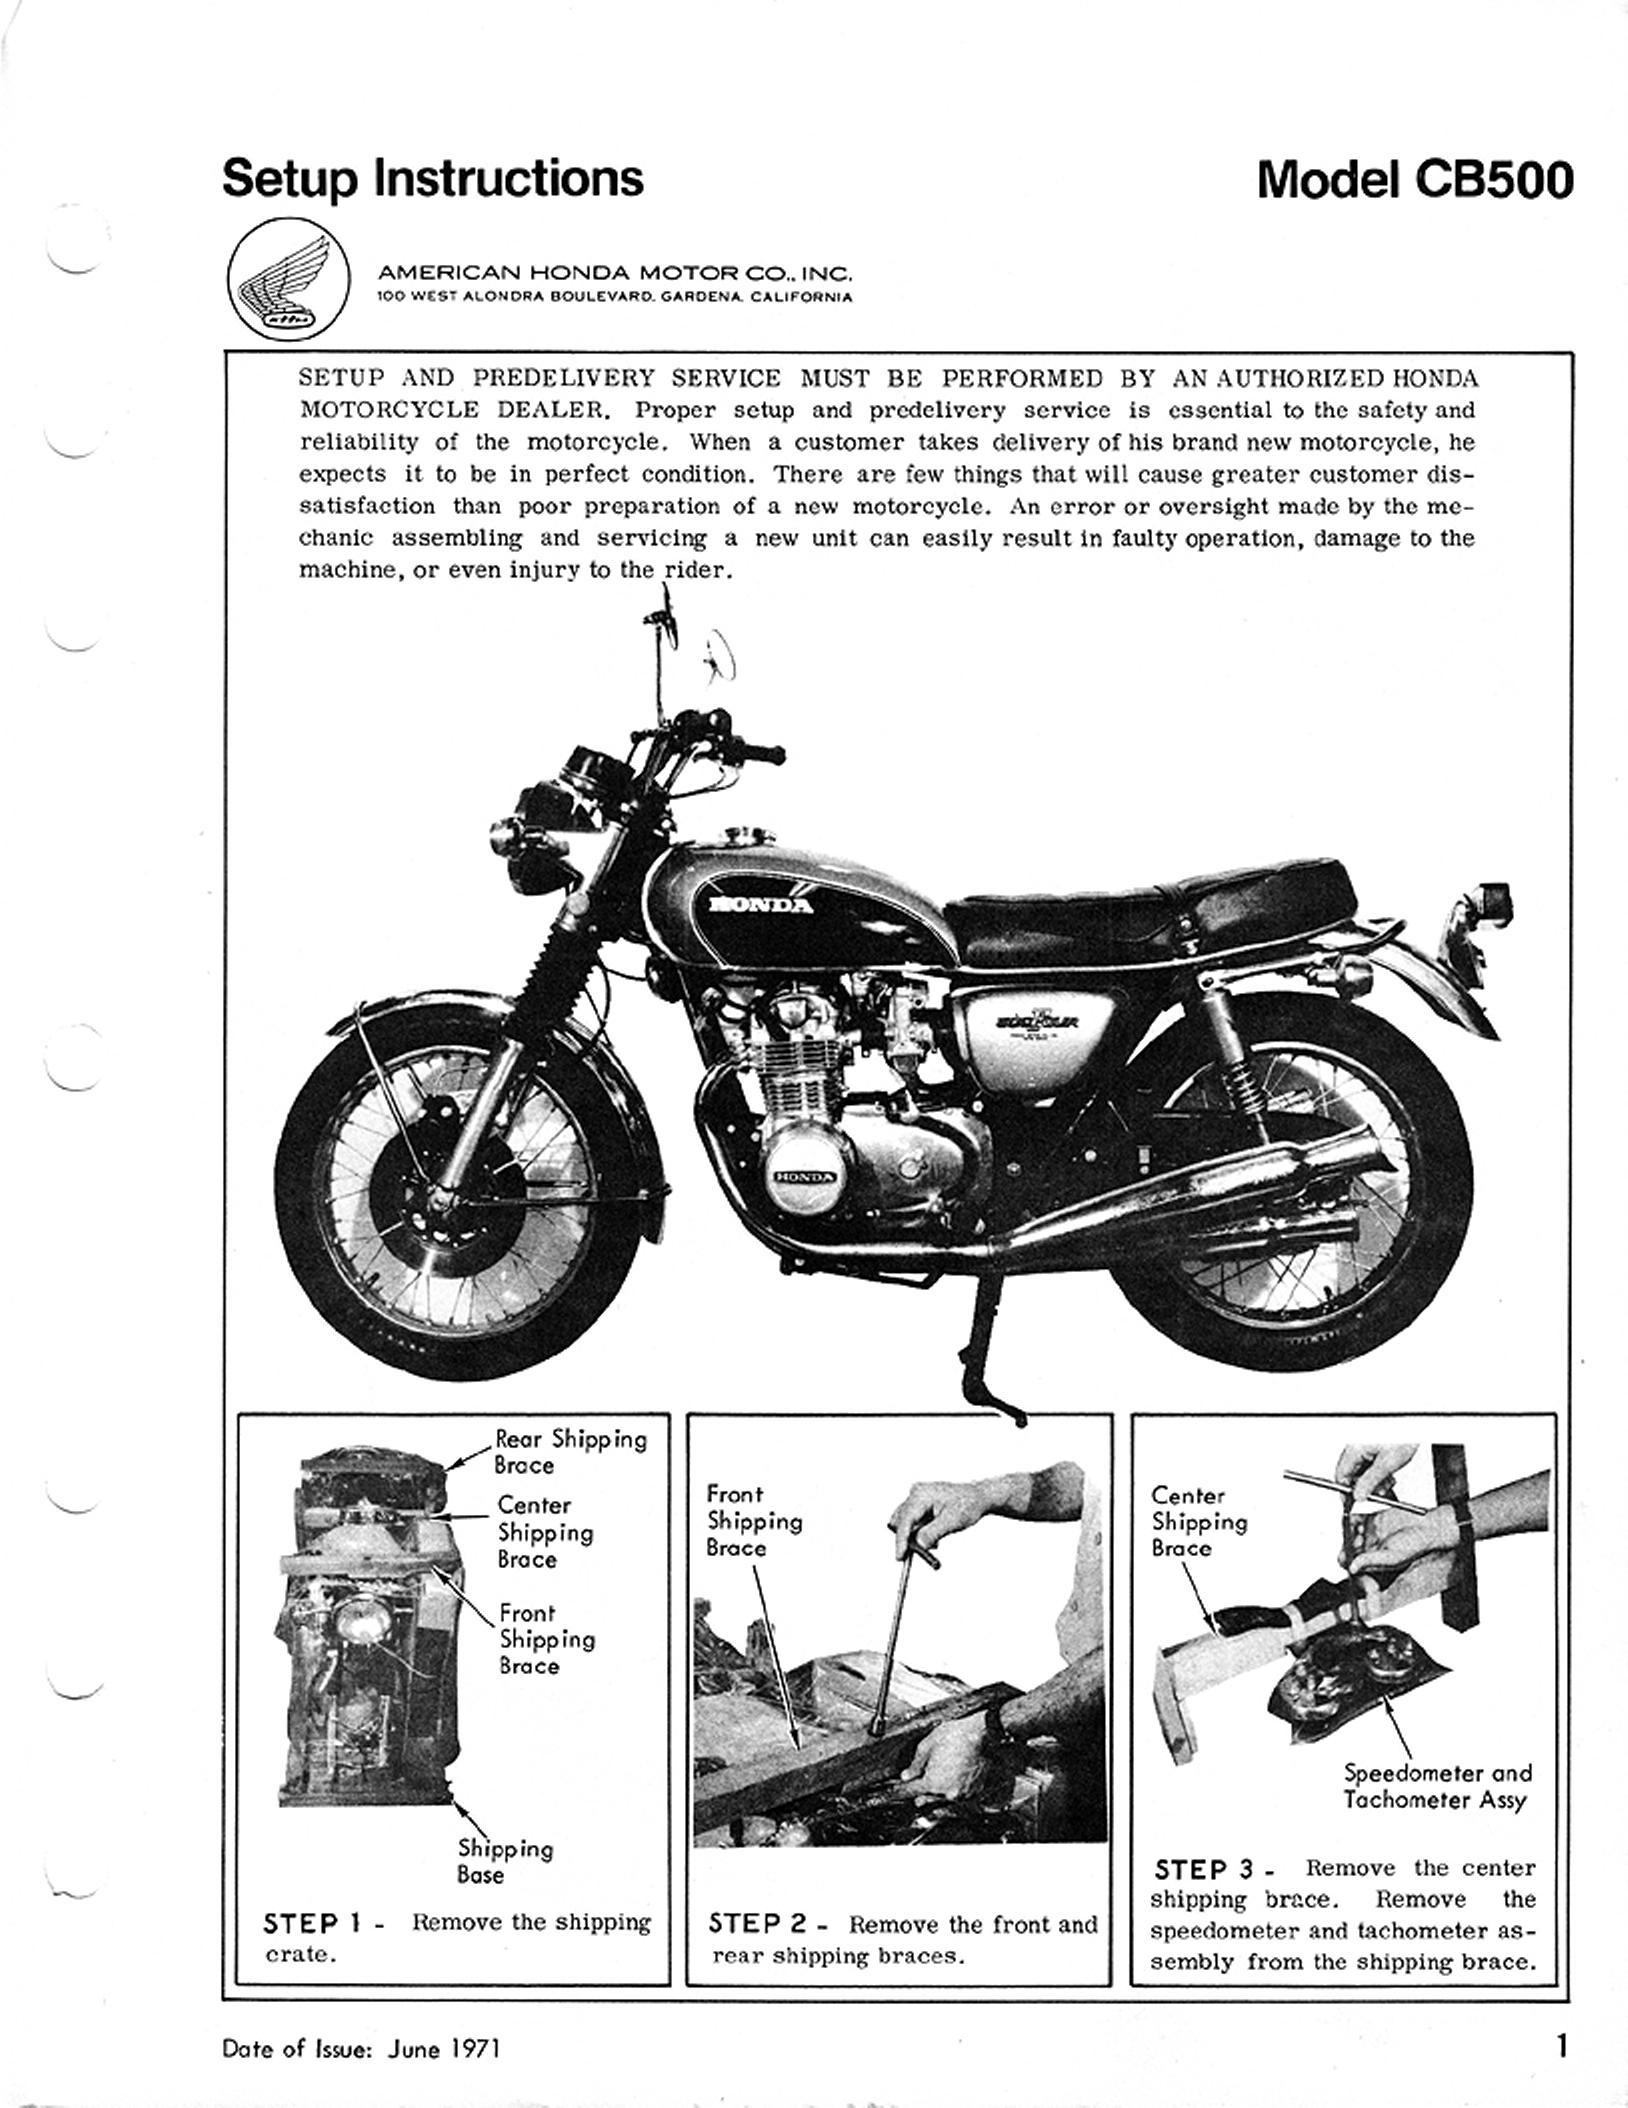 Setup Manual for Honda CB500 (1971)